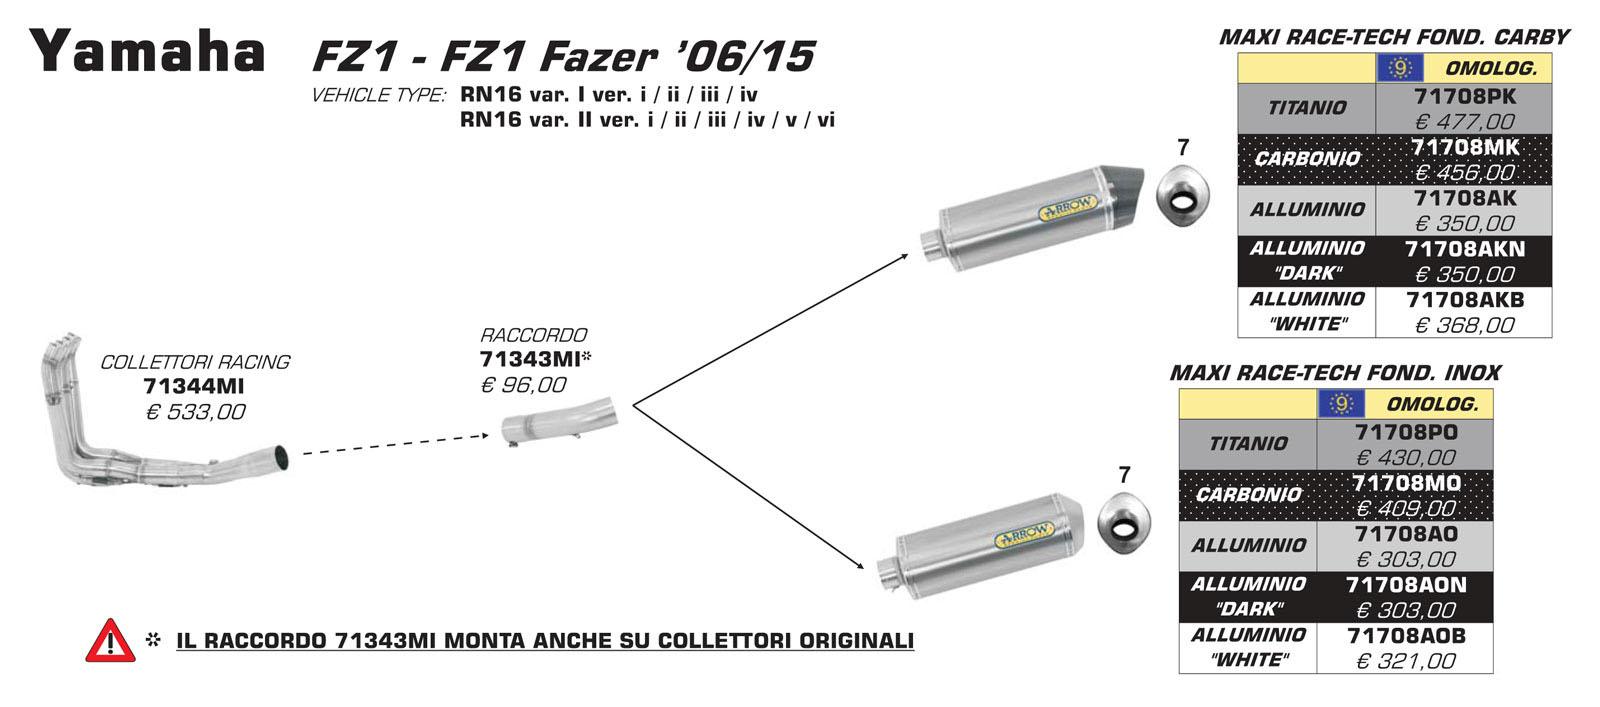 Em Lineamoto Arrow 71708akb 2003 Yamaha Fz1 Wiring Diagram Maxi Race Tech Aluminium White Silencer With Carby End Cap